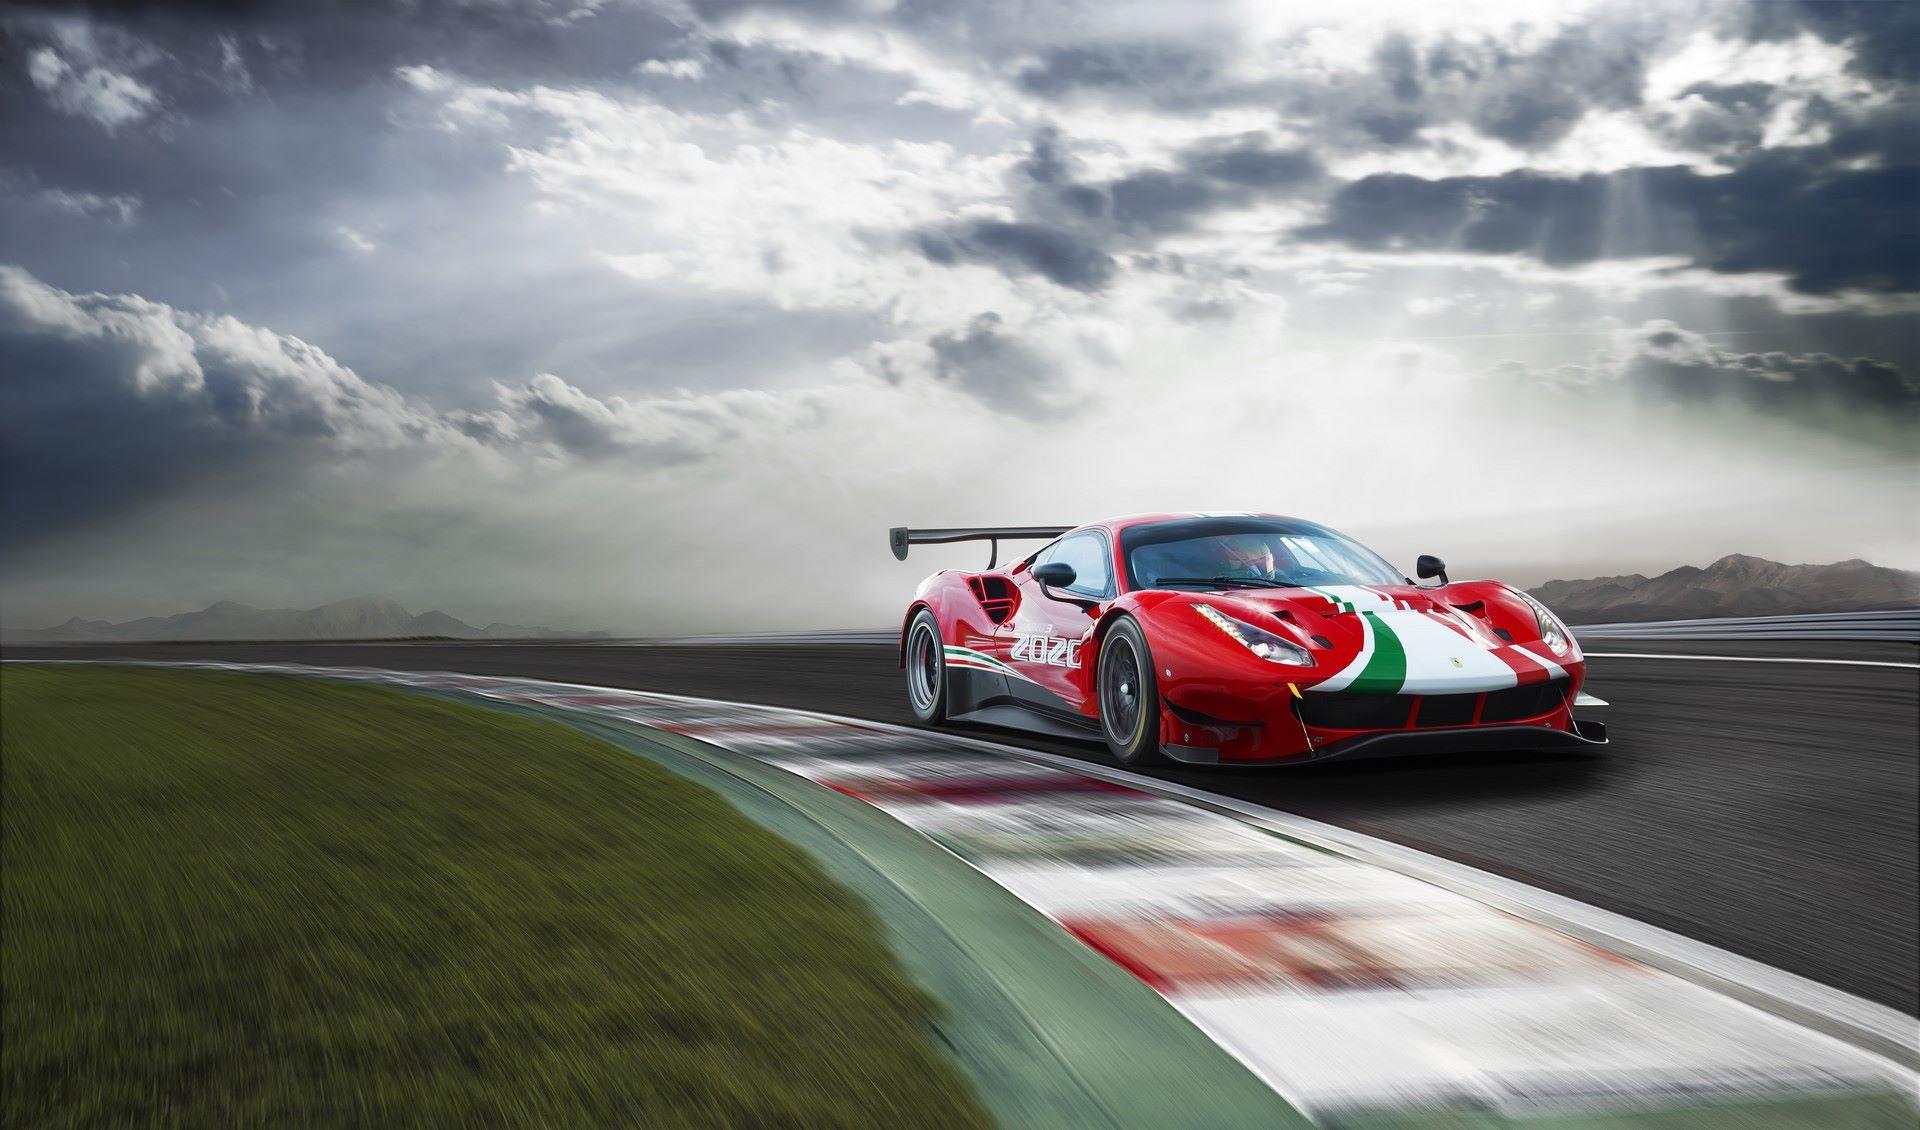 Ferrari-488-GT3-Evο-2020-5